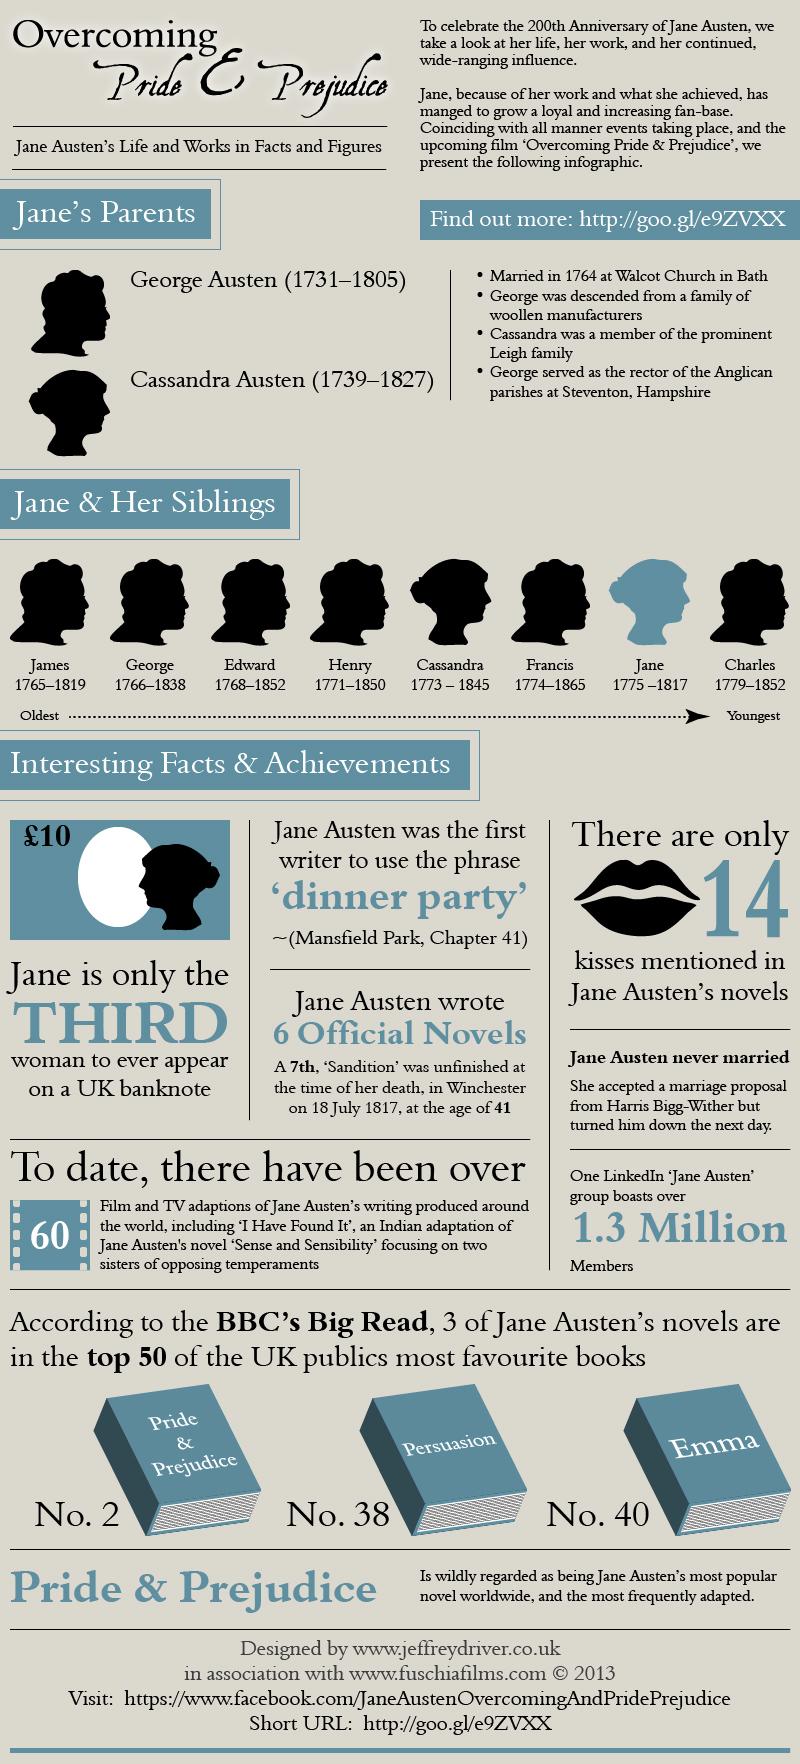 Jane Austen, Overcoming Pride & Prejudice - Infographic